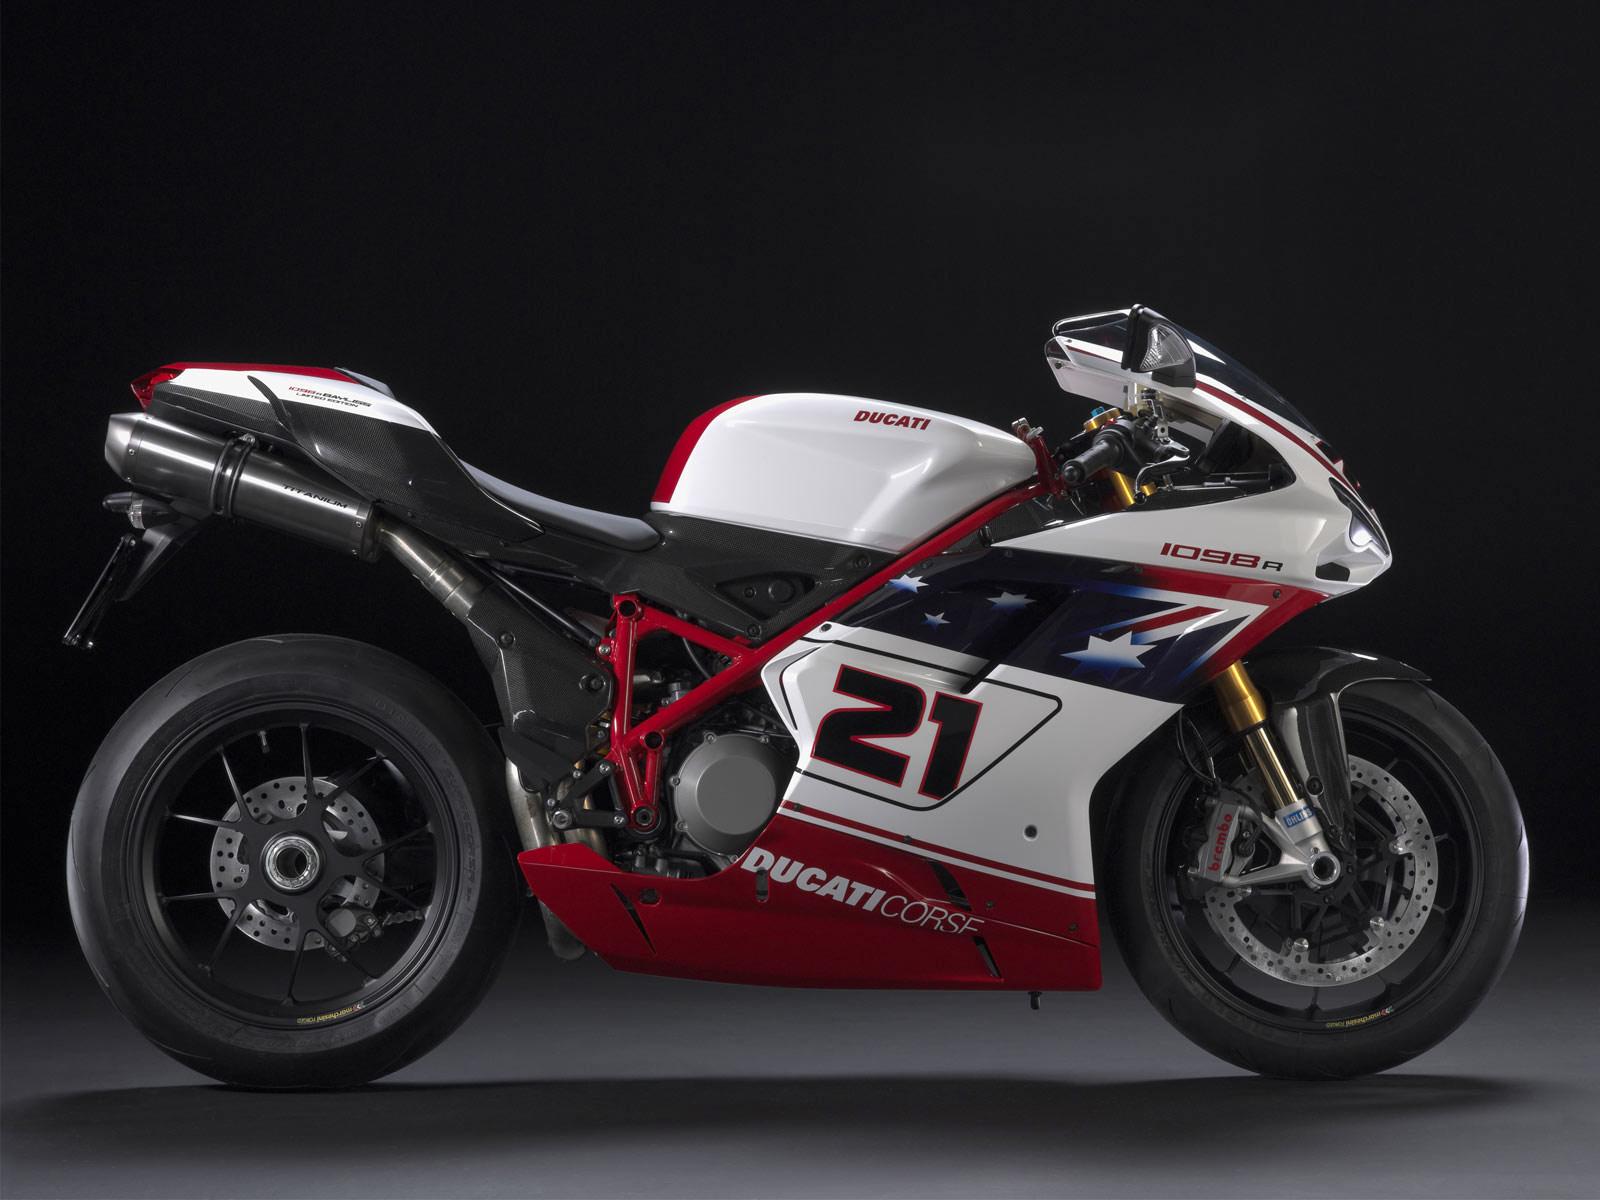 Ducati Motorcycle Wallpaper 6712 Hd Wallpapers in Bikes   Imagescicom 1600x1200